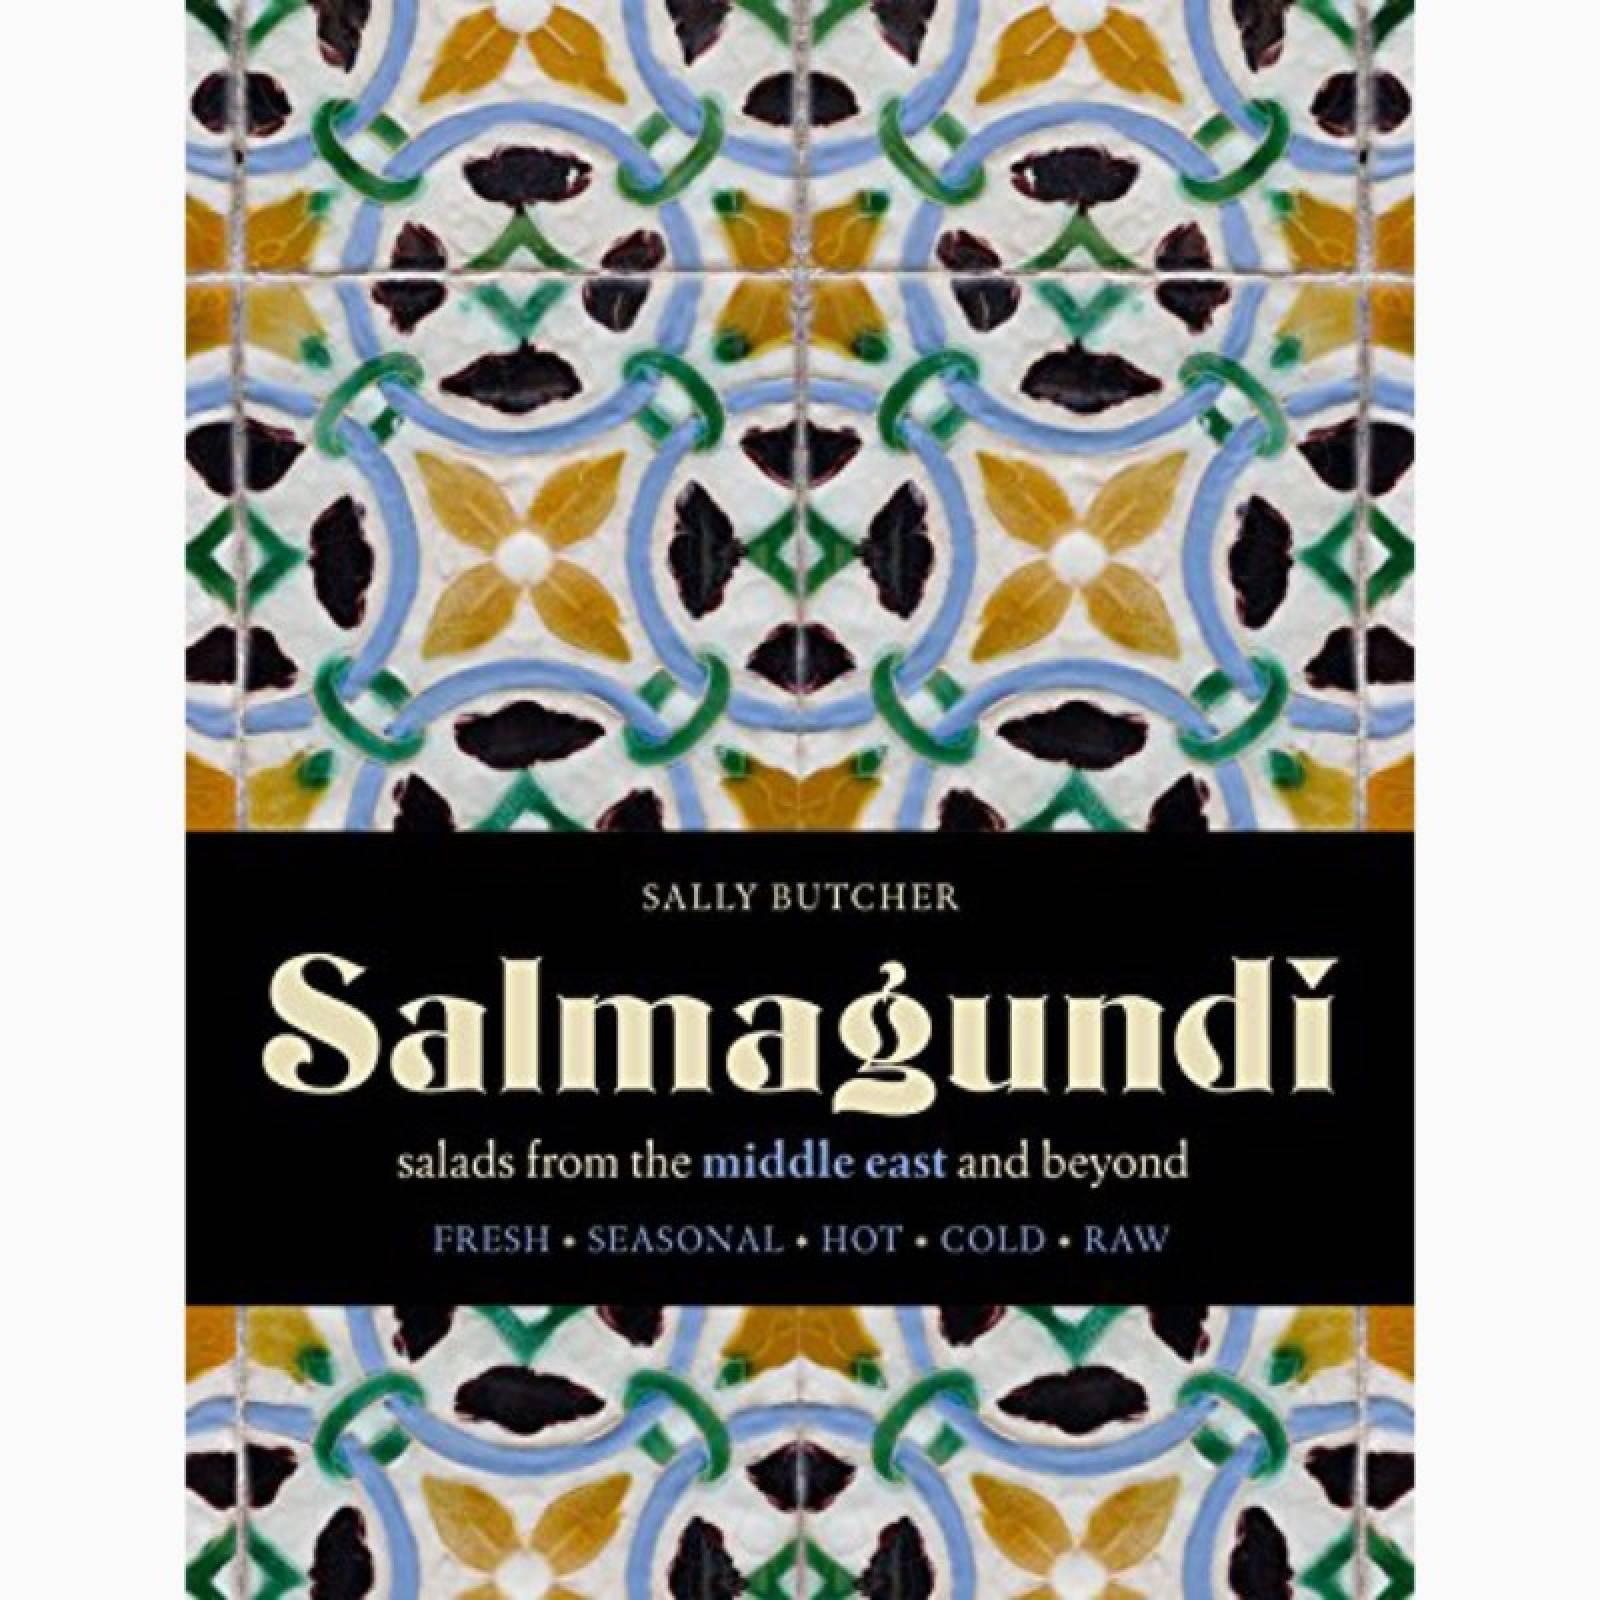 Salmagundi: A celebration of salads - Hardback Book